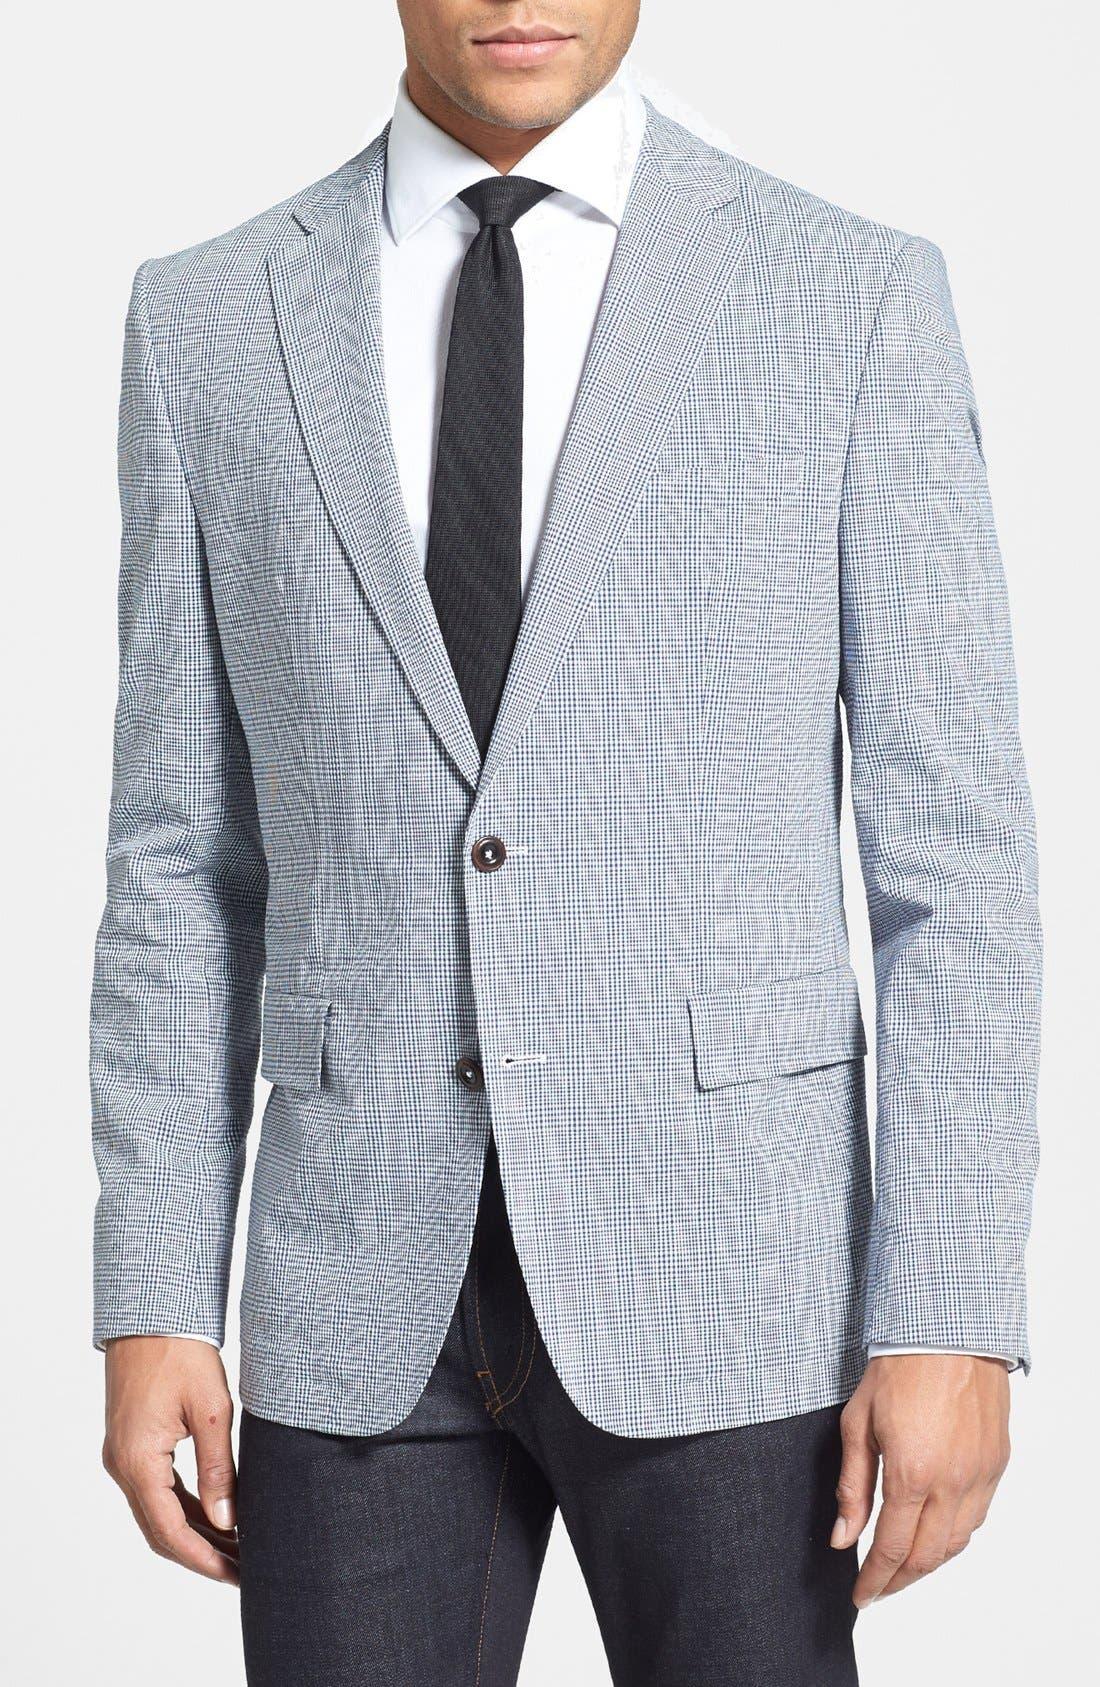 Alternate Image 1 Selected - BOSS HUGO BOSS 'Noris' Trim Fit Plaid Sportcoat